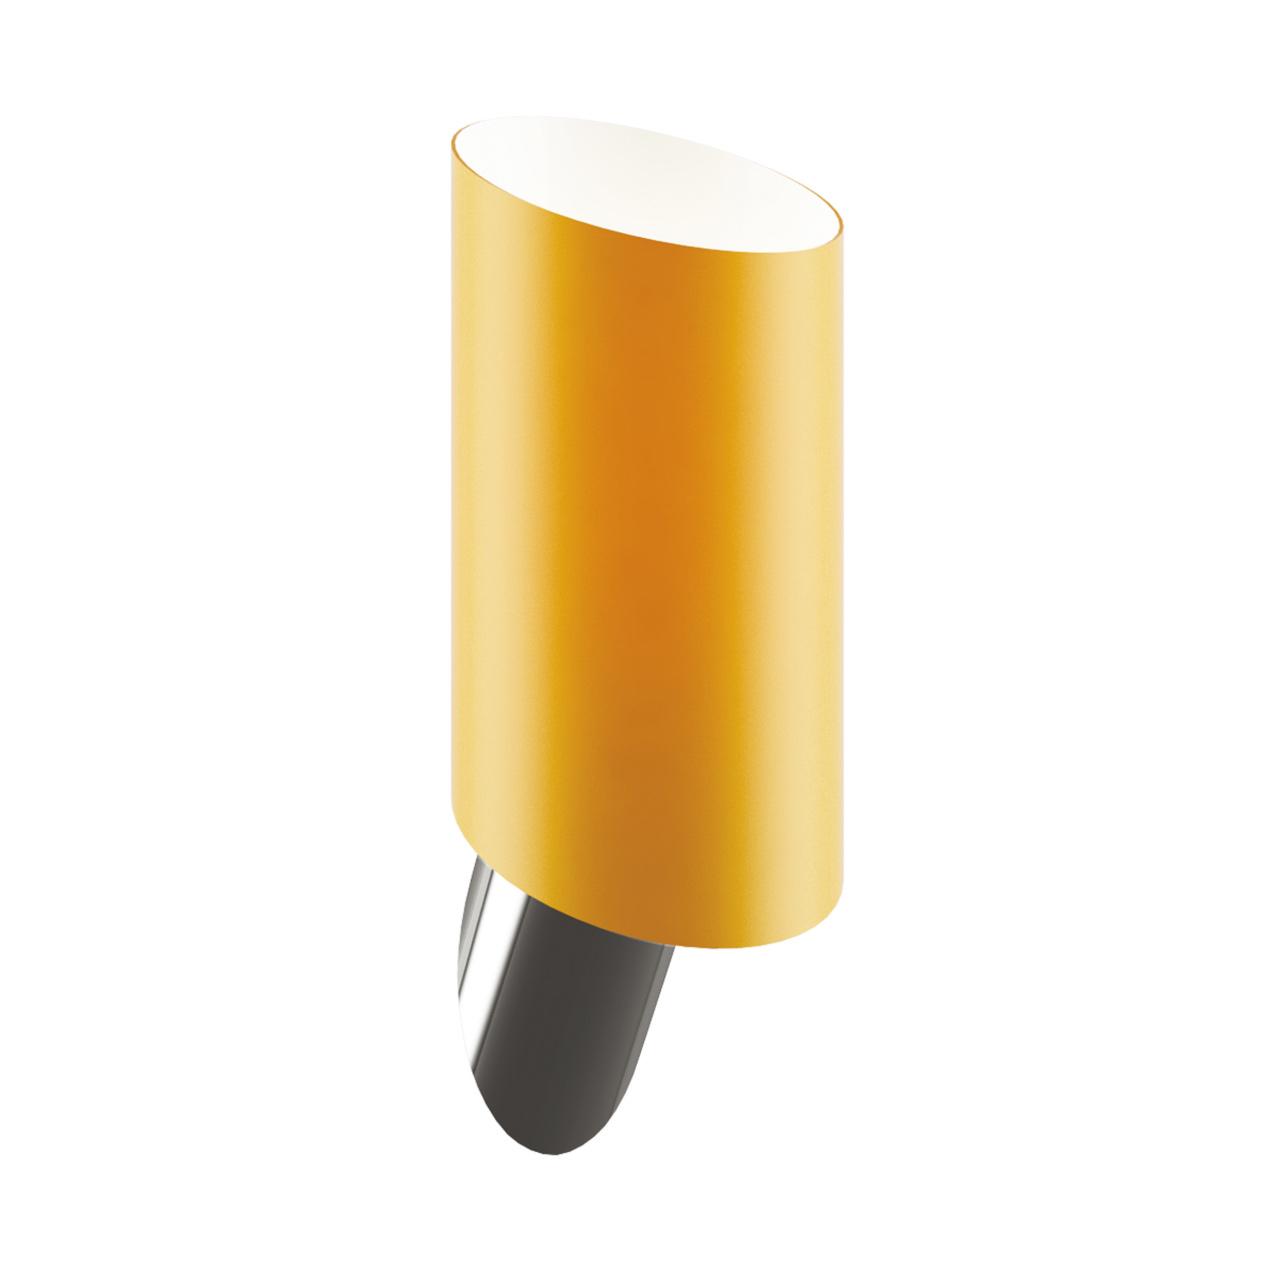 Светильник настенный Muro 1х40W E14 янтарь/никель Lightstar 808613